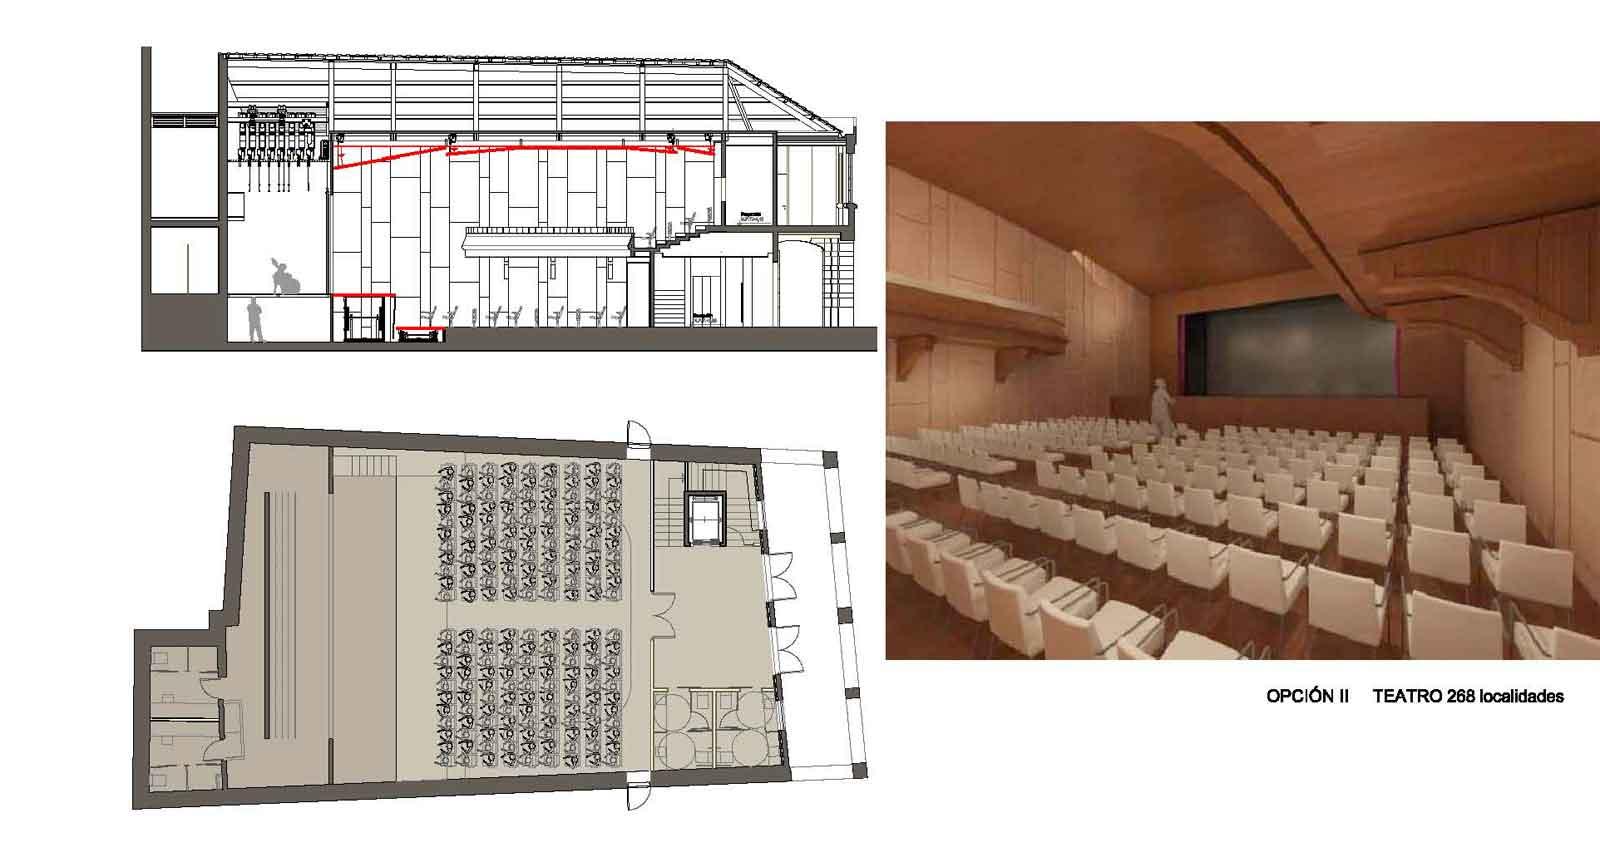 04-opcion-II-teatro